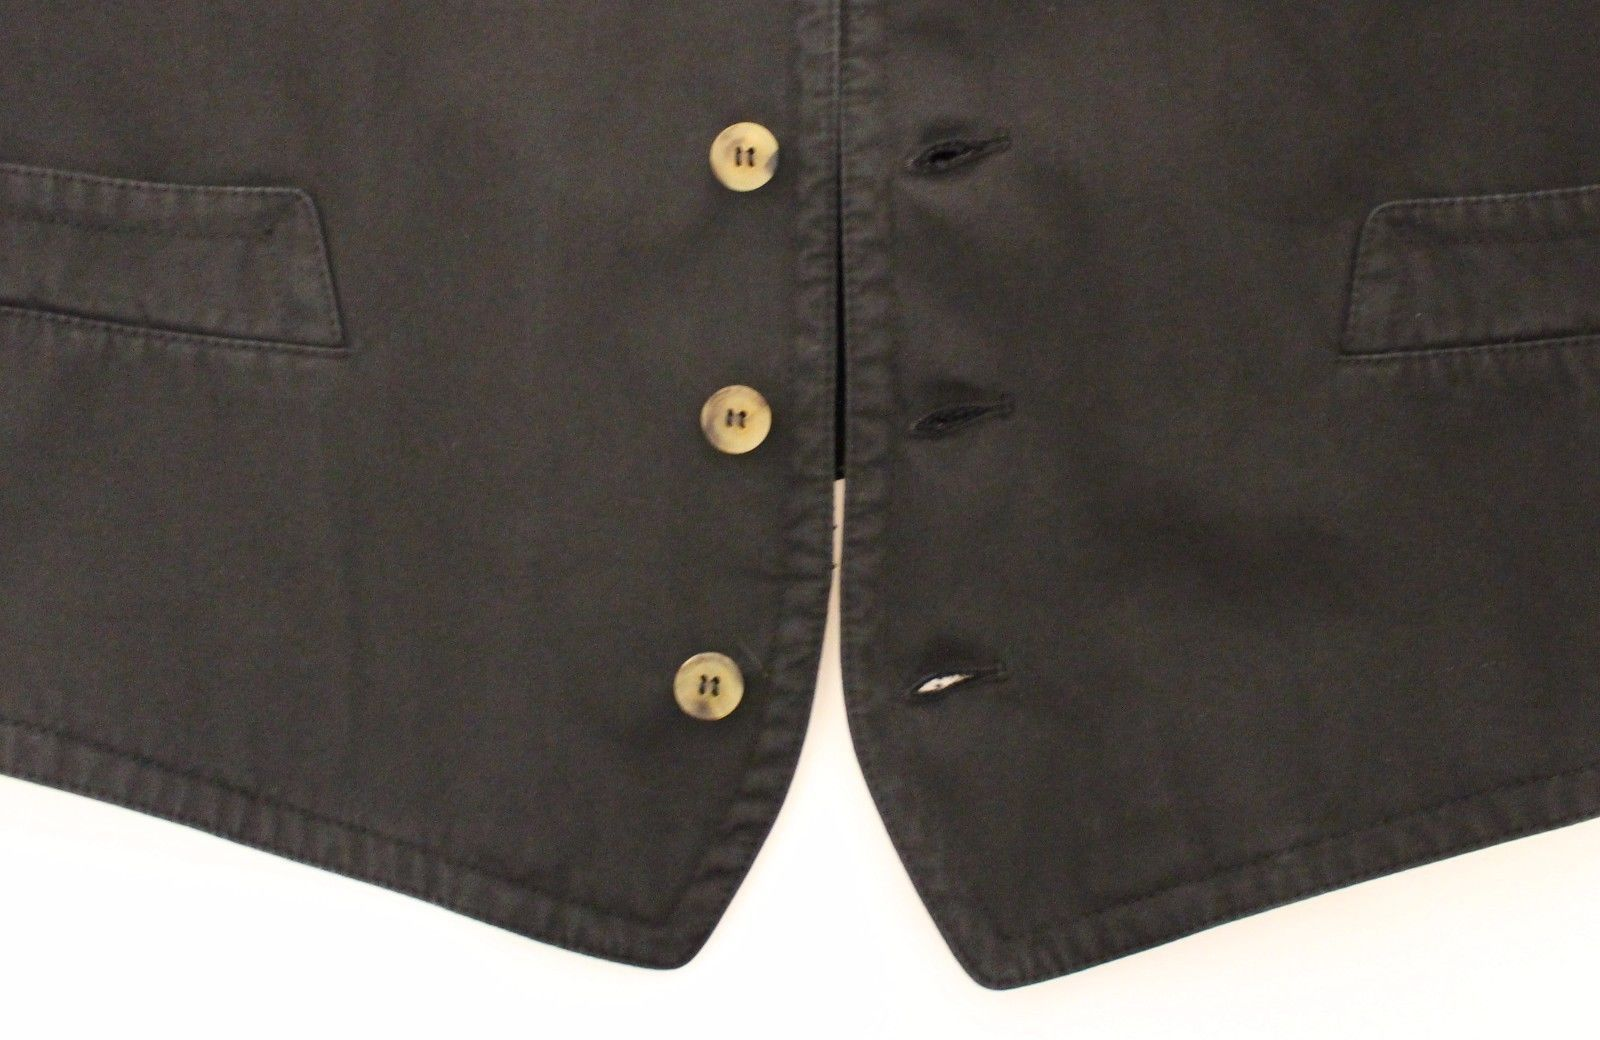 Dolce & Gabbana Black Cotton Viscose Dress Vest Blazer